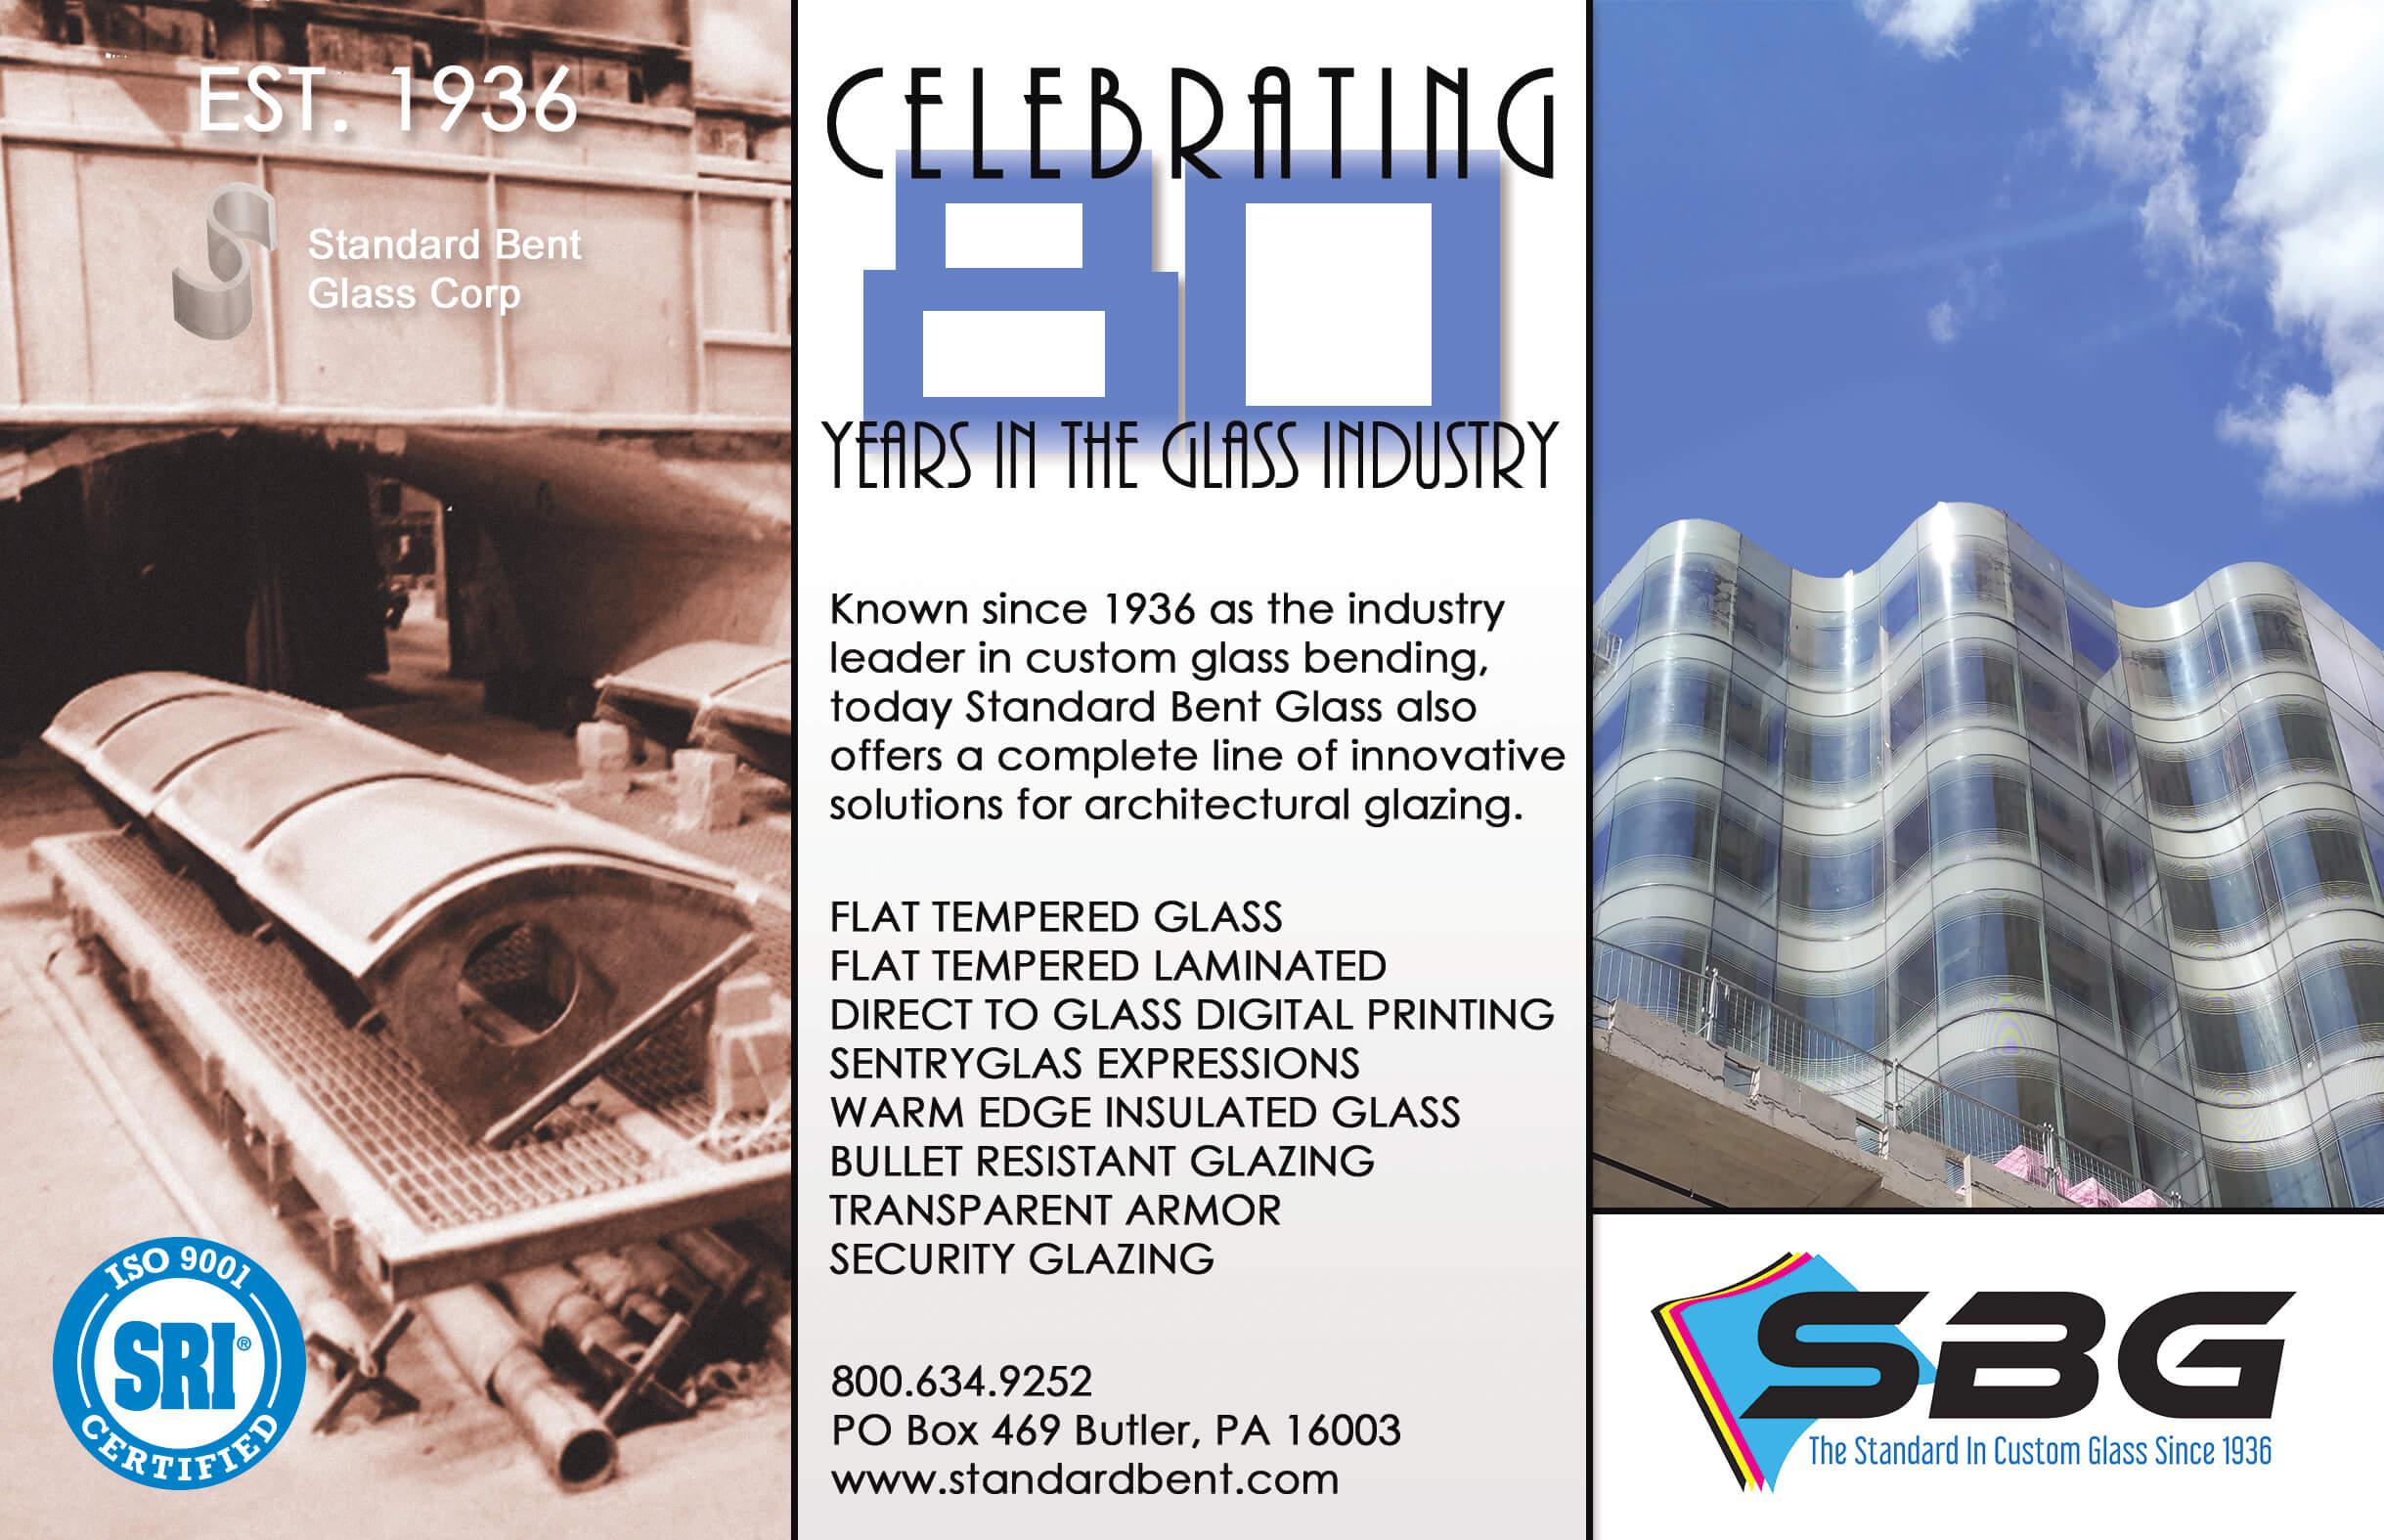 SBG Celebrates 80 Years